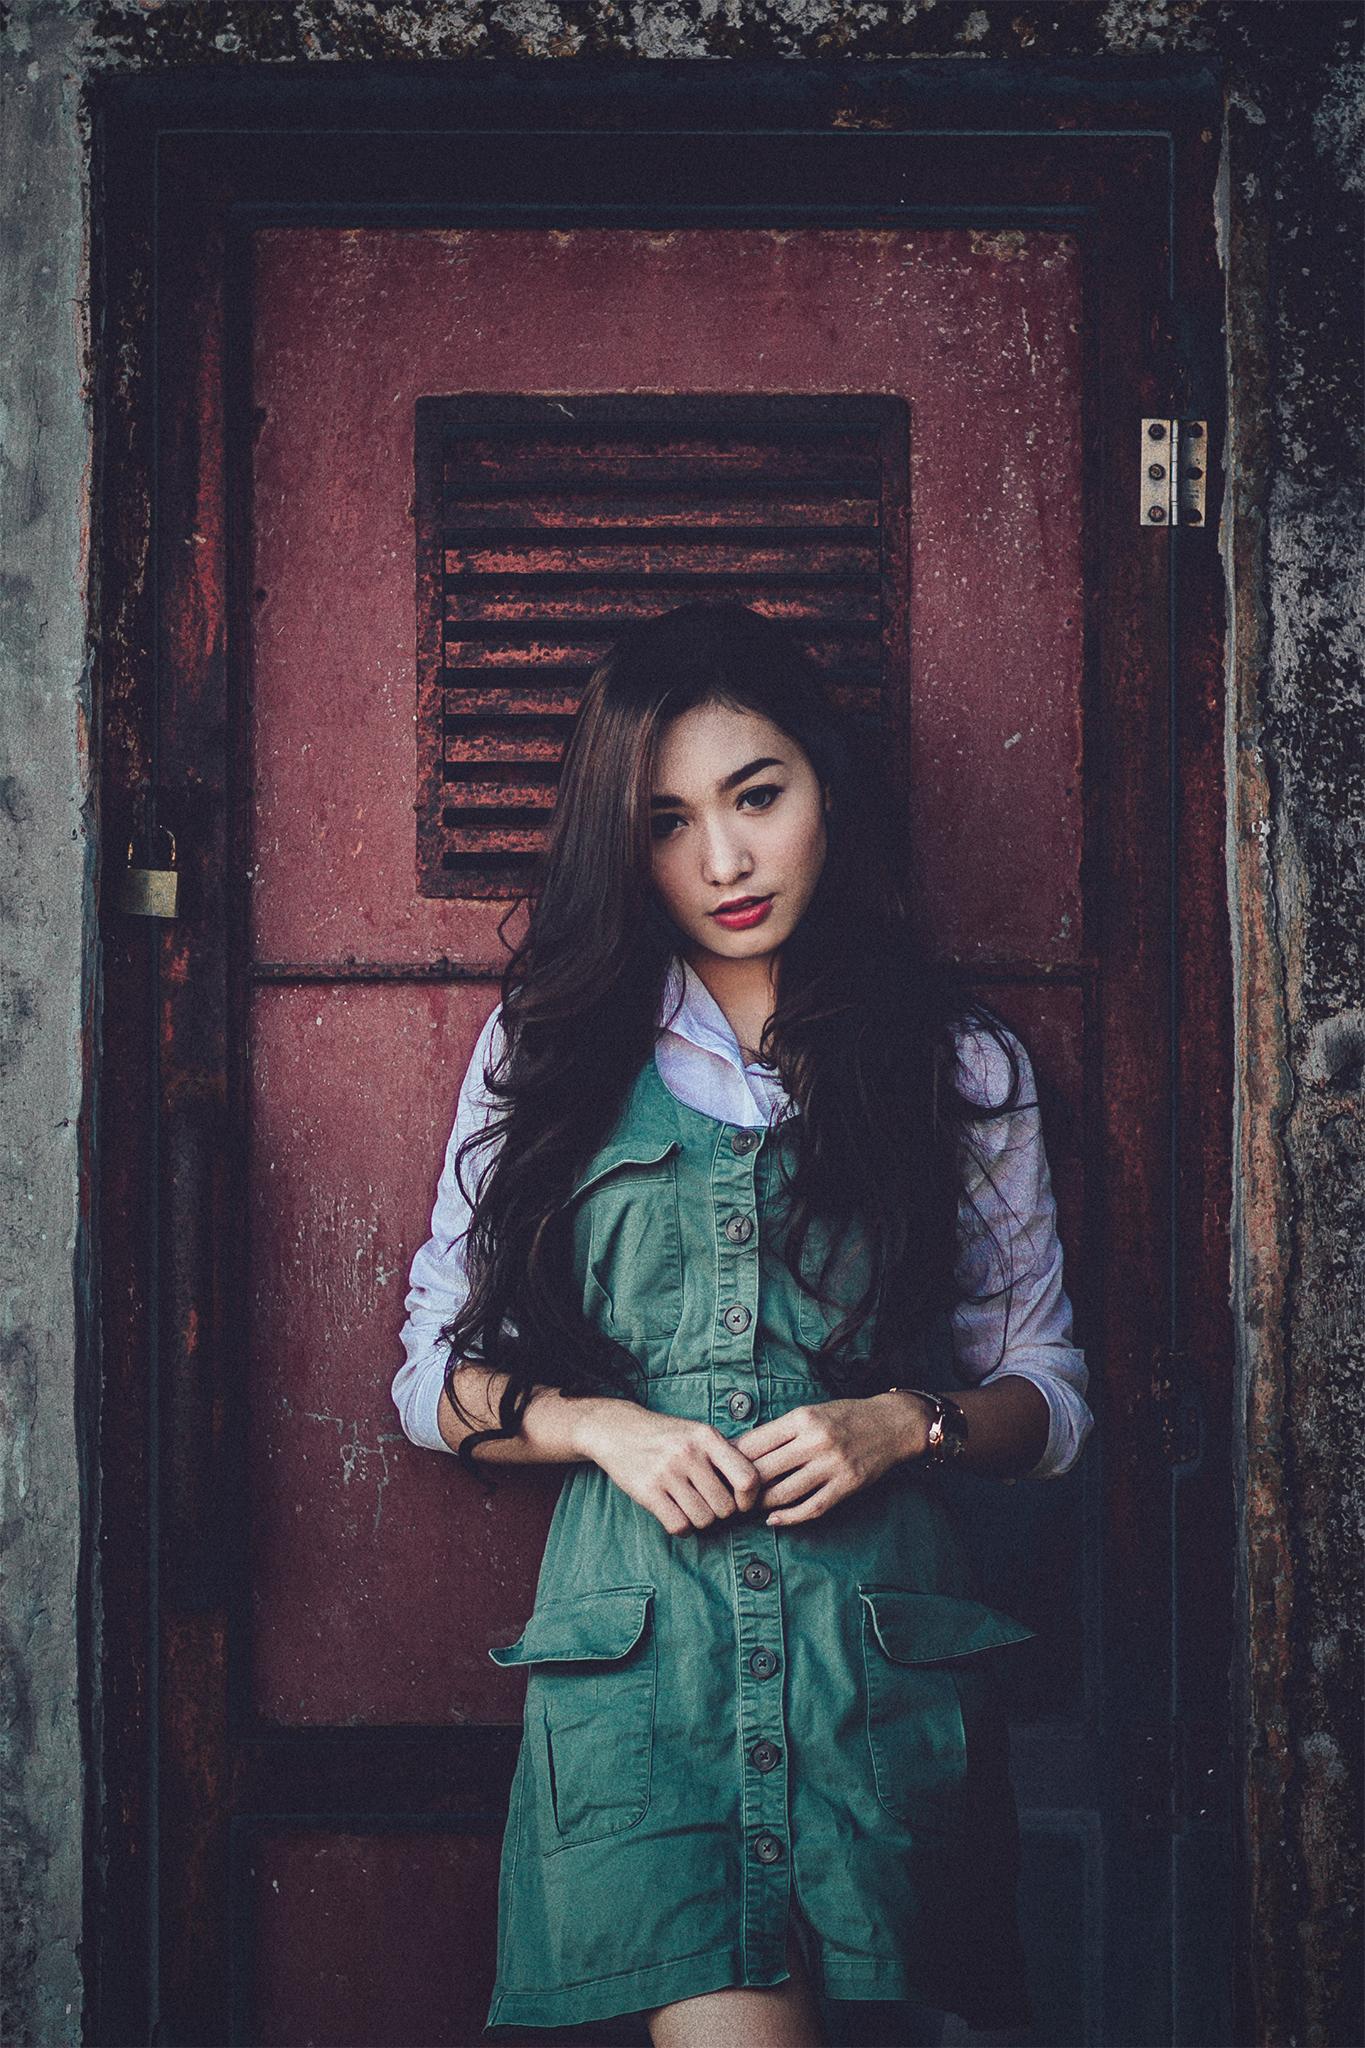 The-Doorkeeper-by-Jirupu